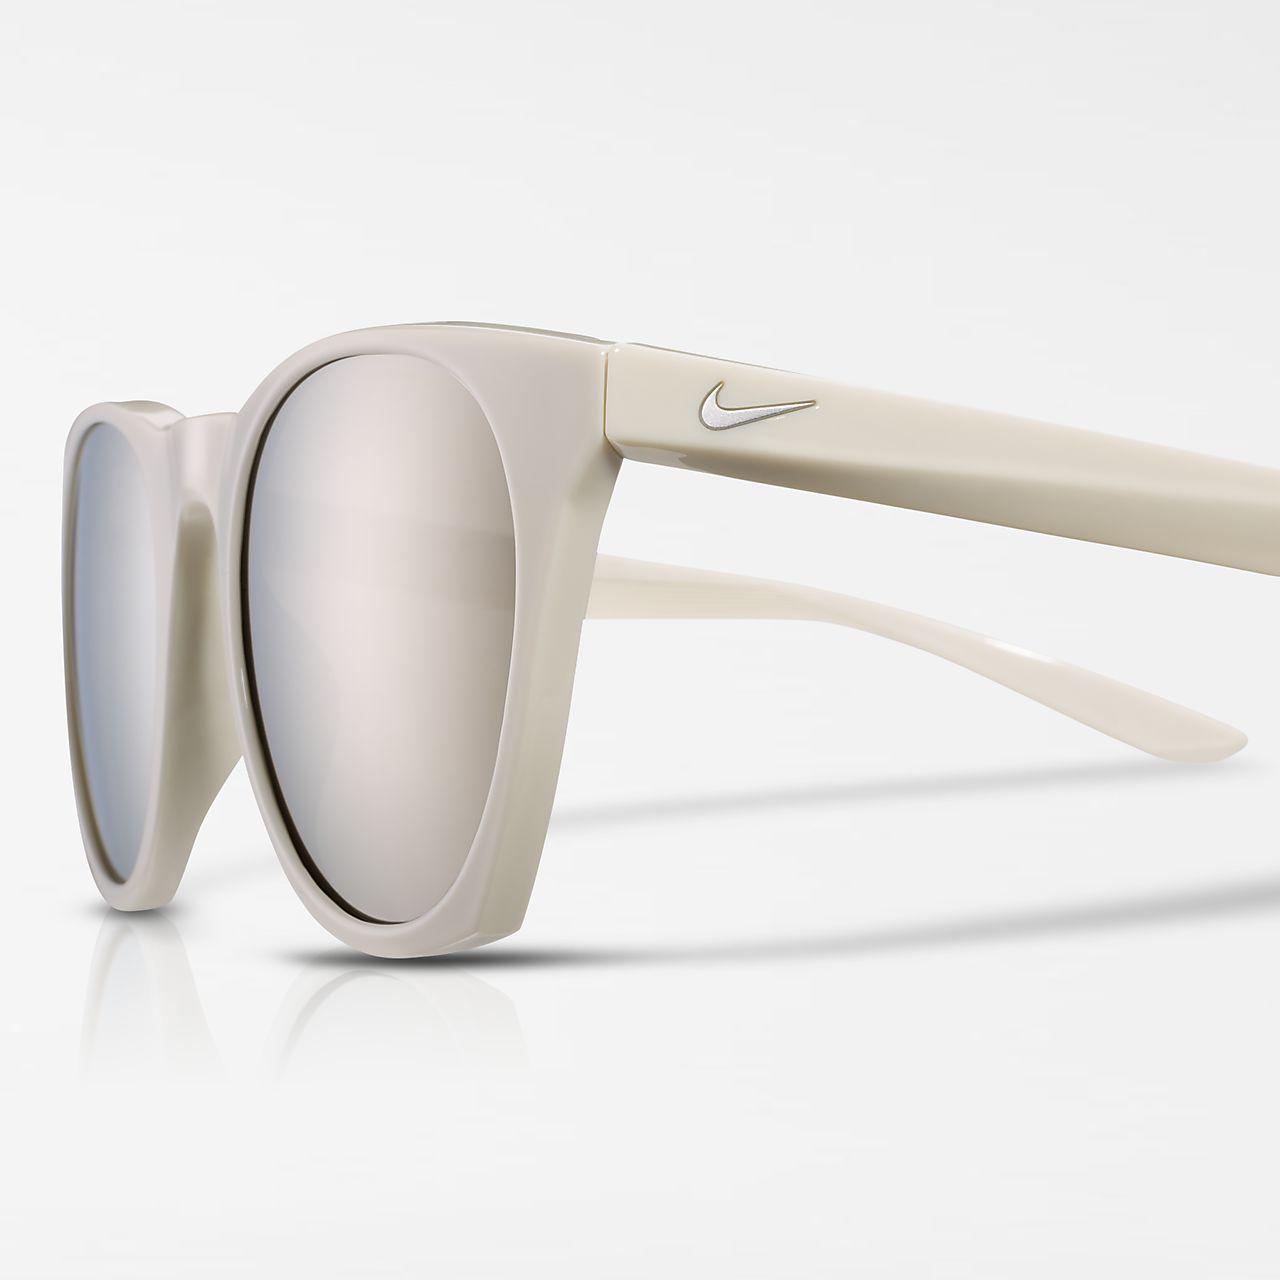 Nike Essential Horizon Mirrored Sunglasses